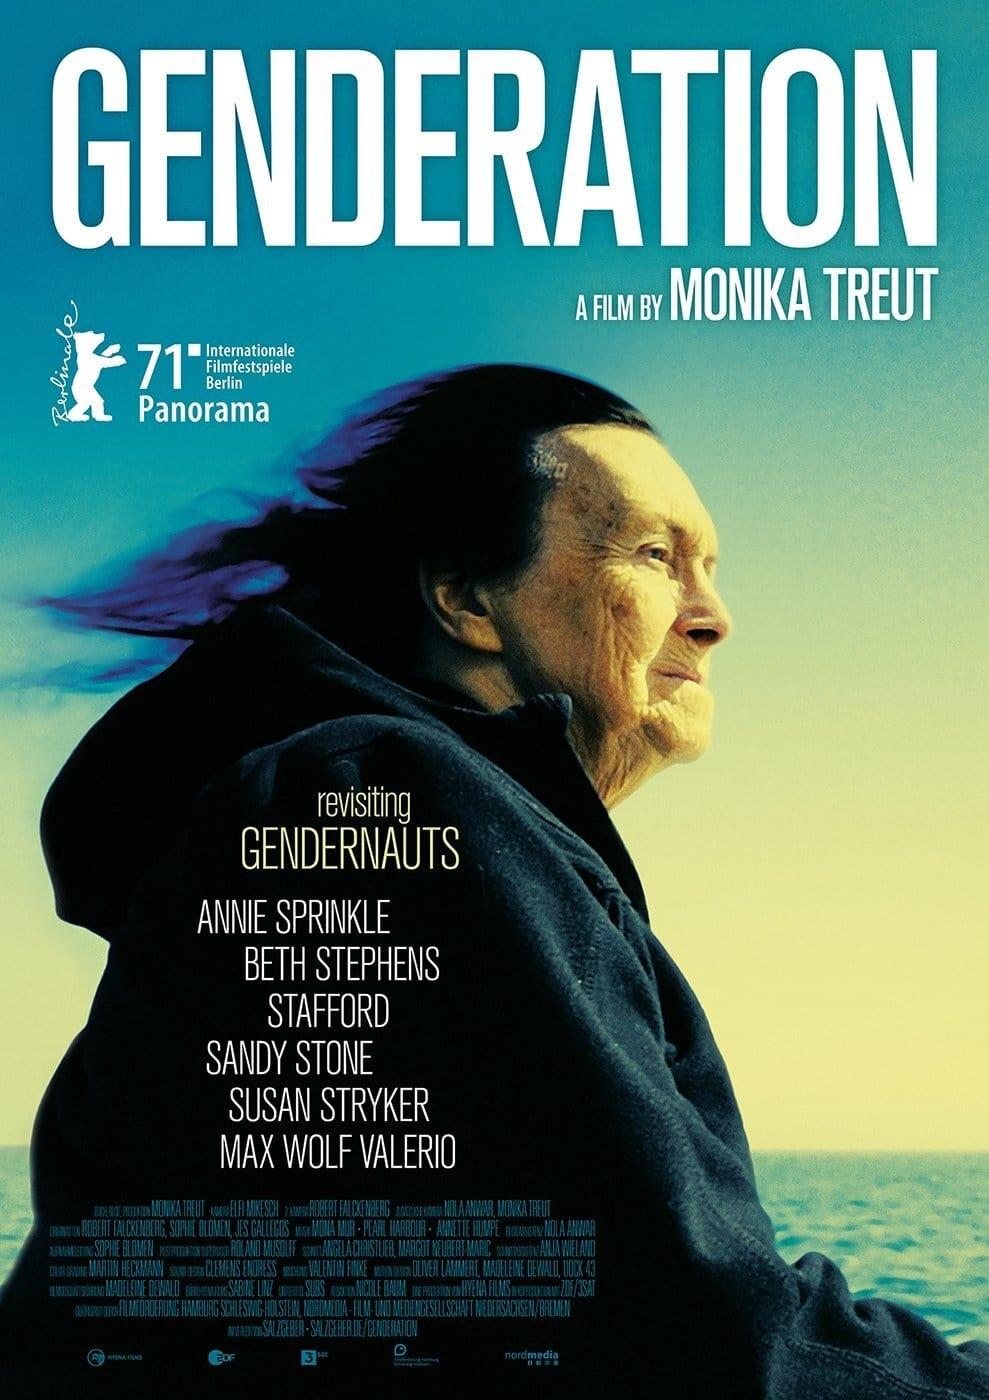 Genderation